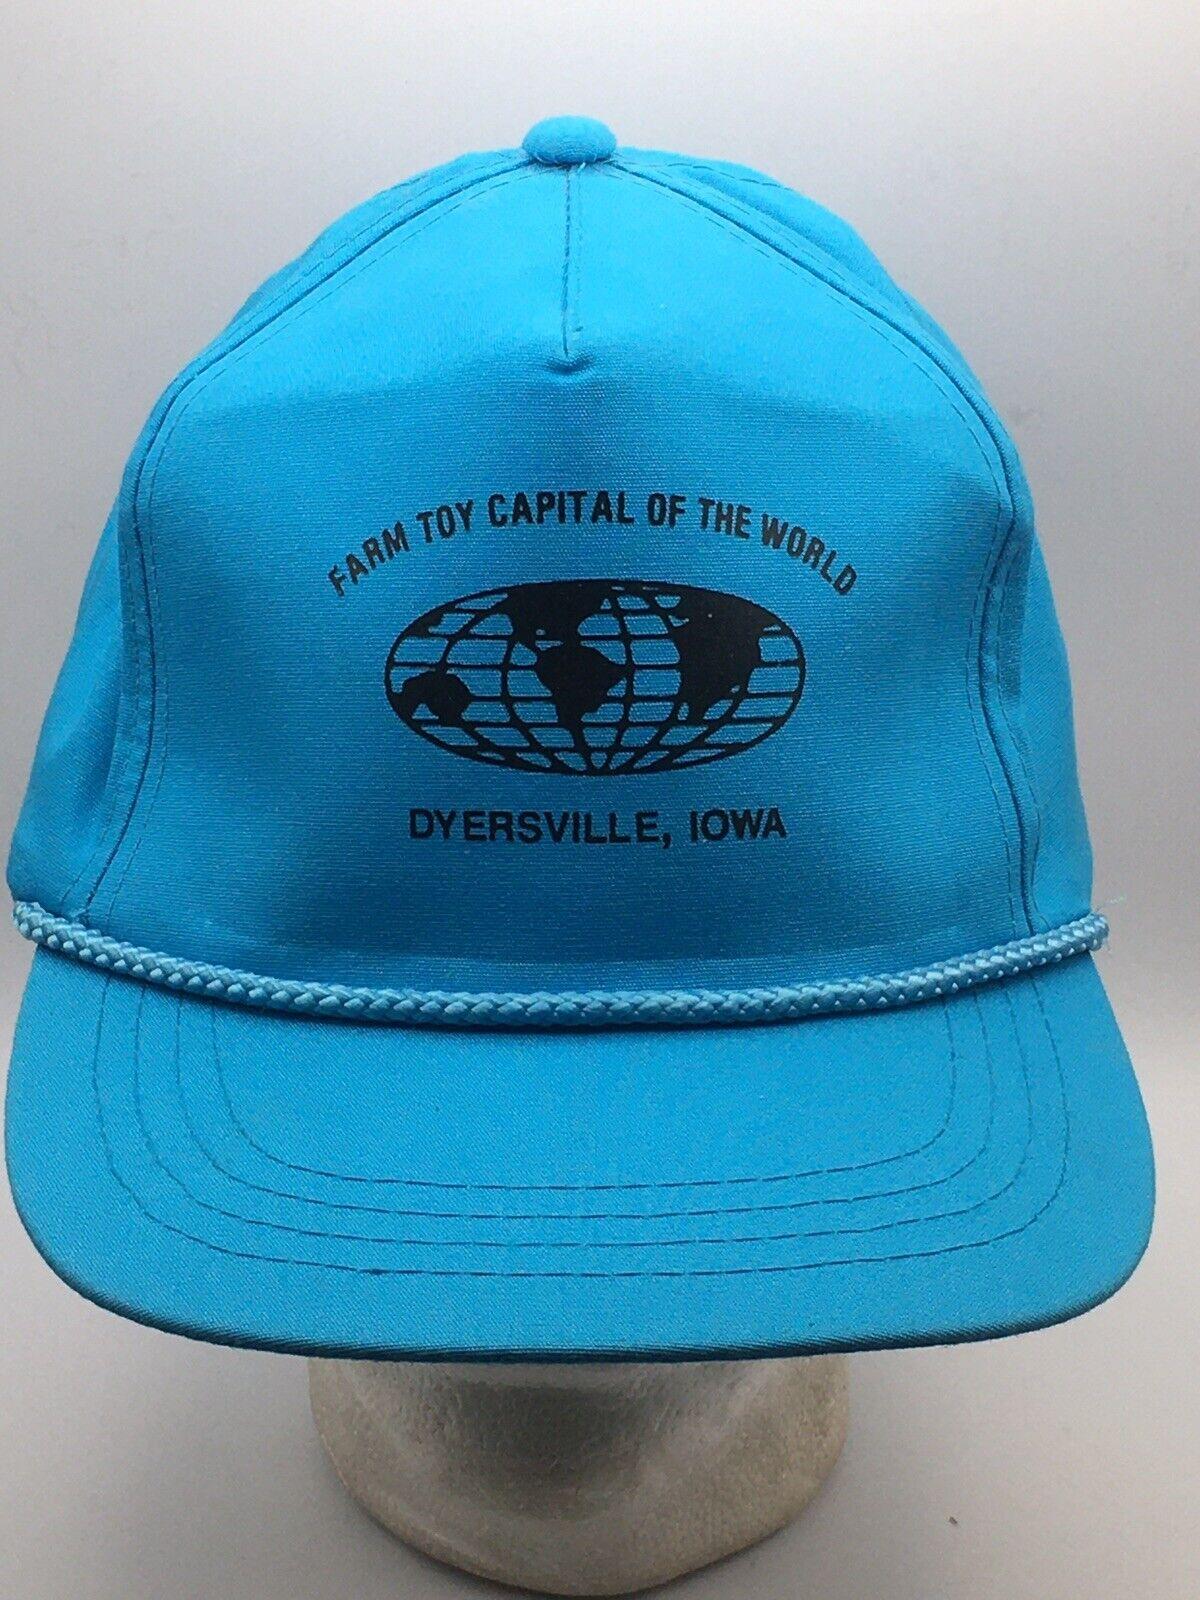 """Farm Toy Capitol of the World "" Dyersville, IA Iowa Vintage Rope Snapback Hat"